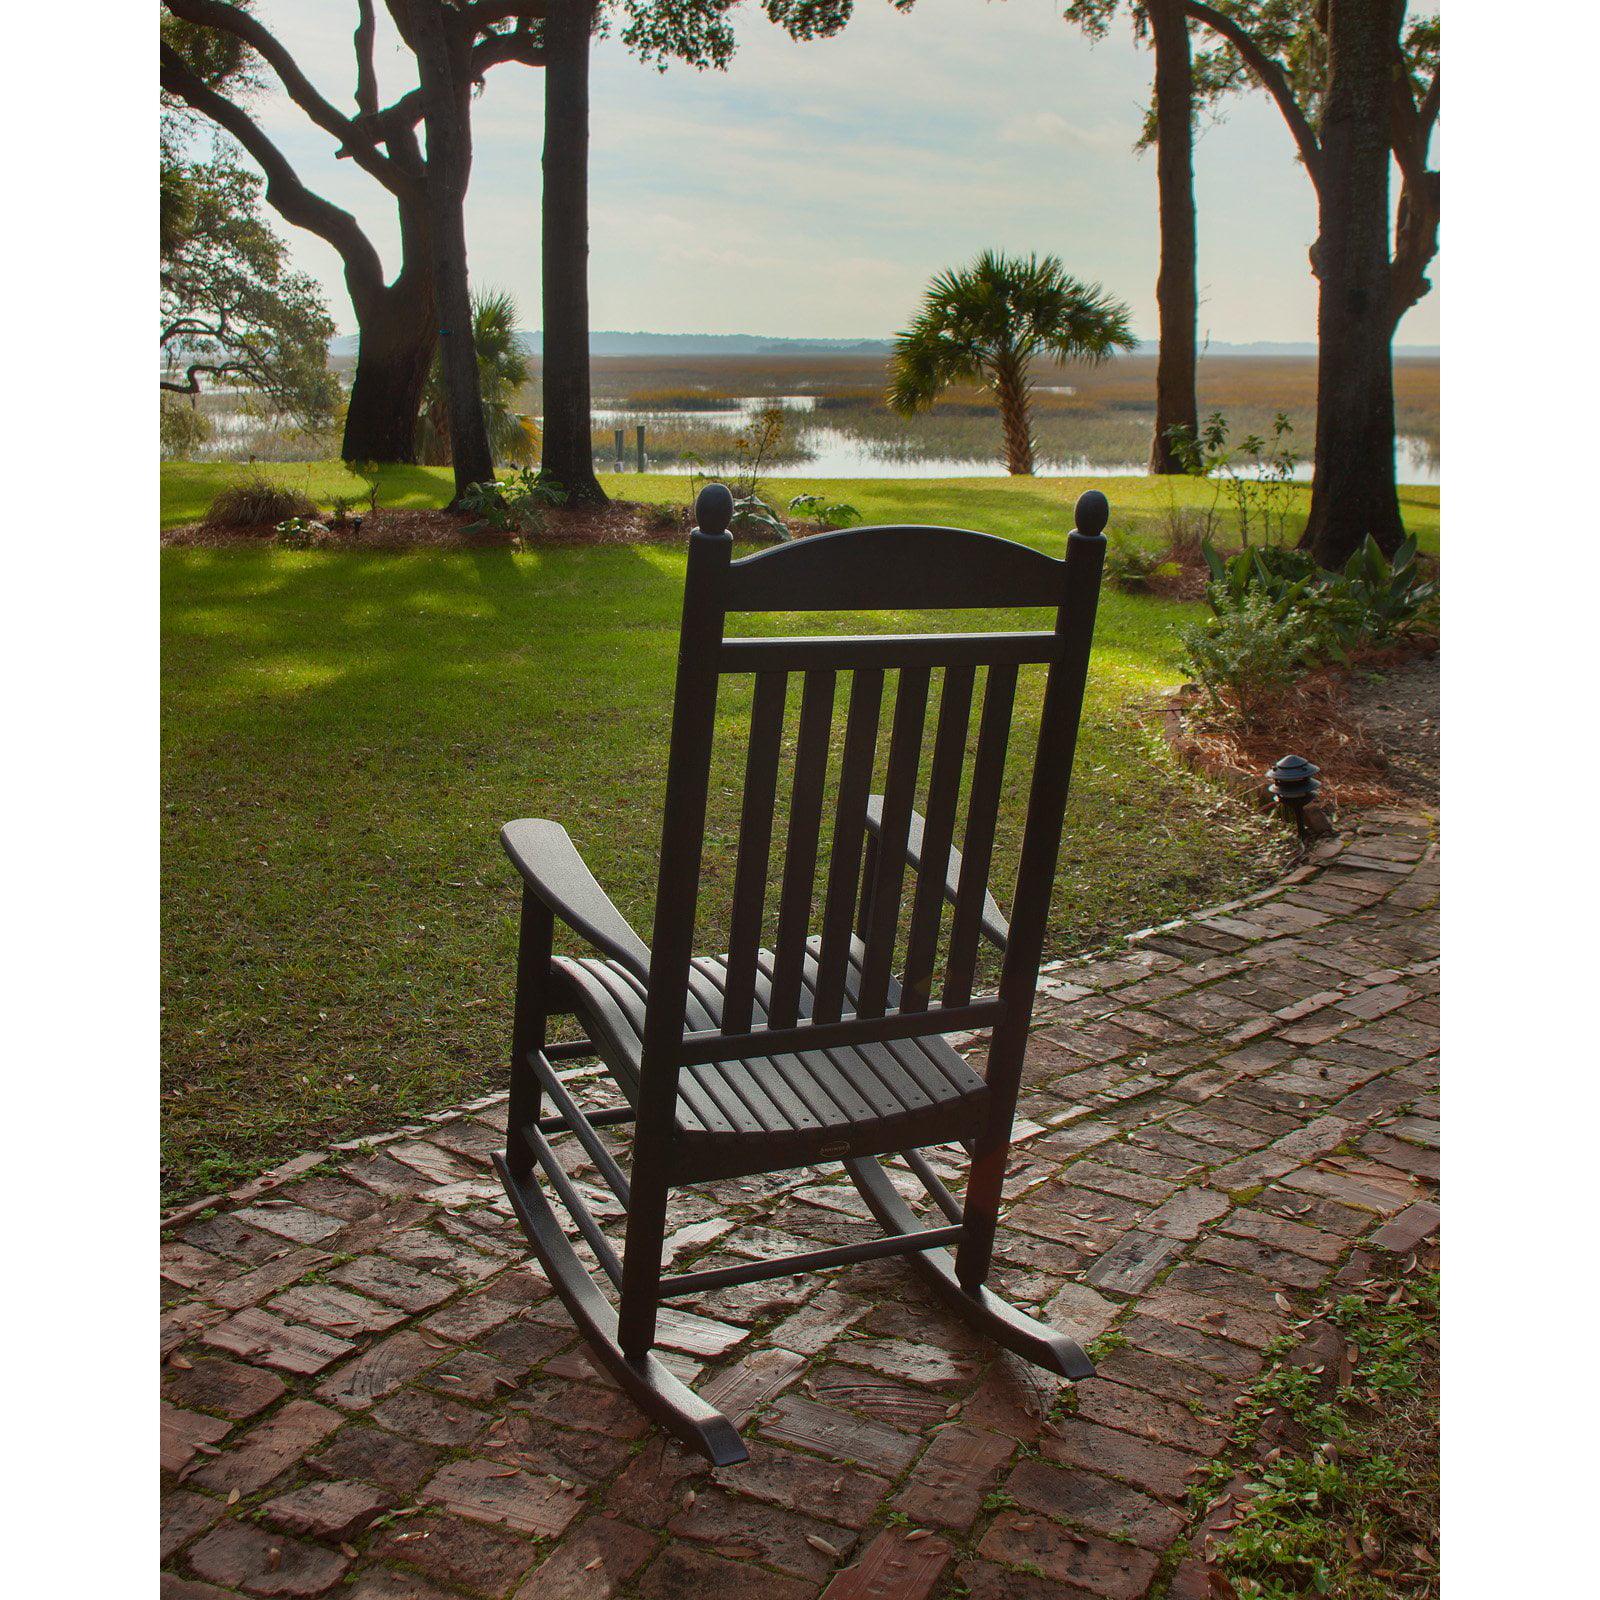 POLYWOOD® Jefferson Recycled Plastic Rocking Chair - Walmart.com